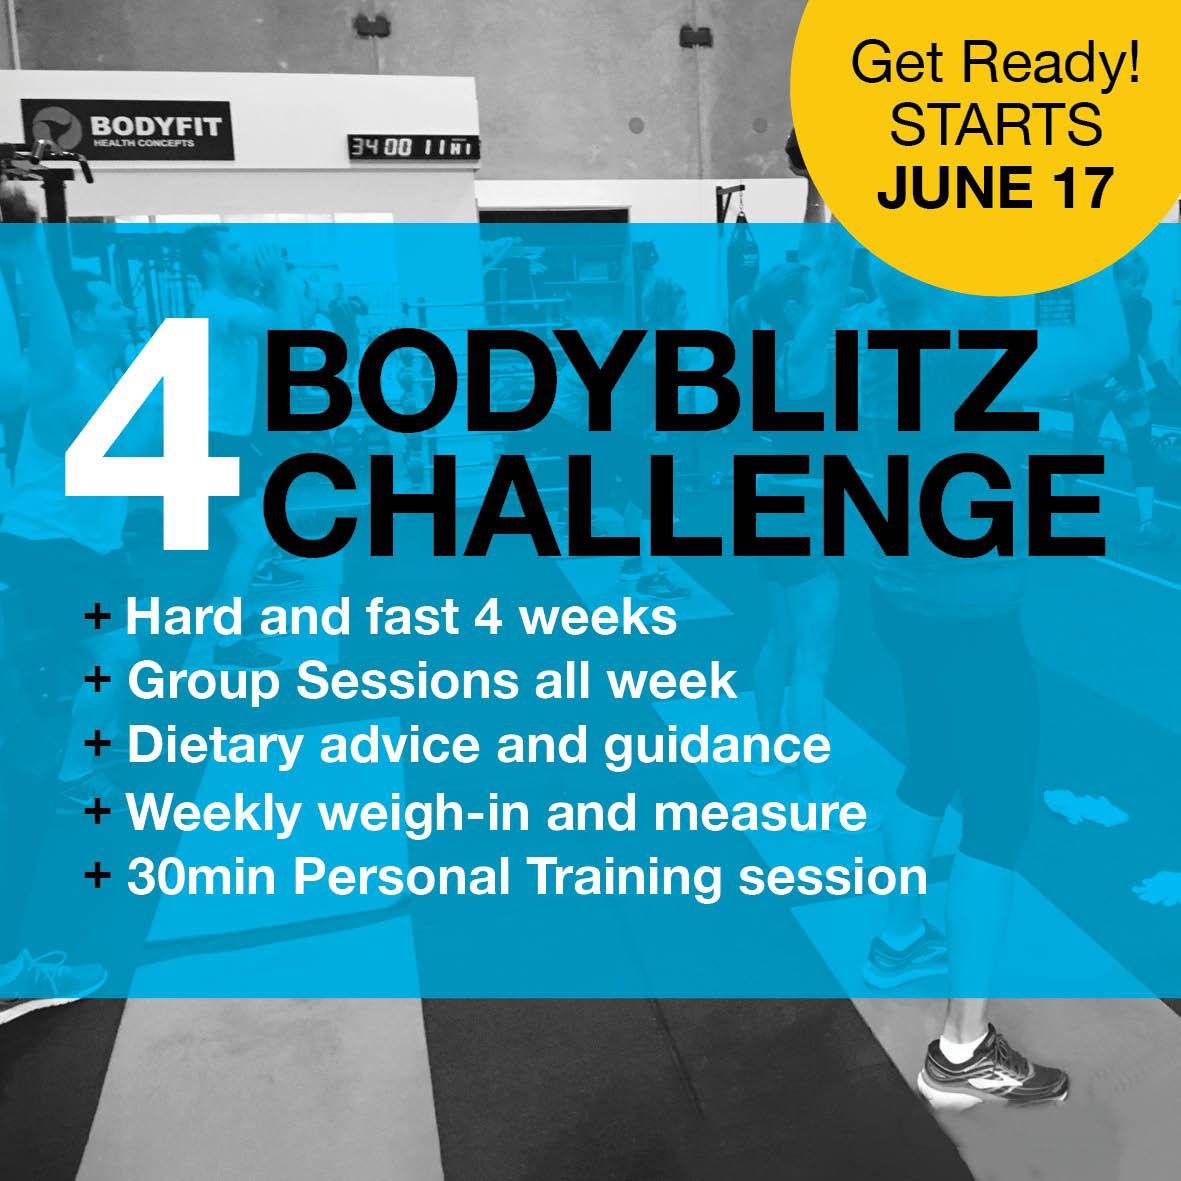 BODYFIT_Challenge_JUNE_WEB.jpg